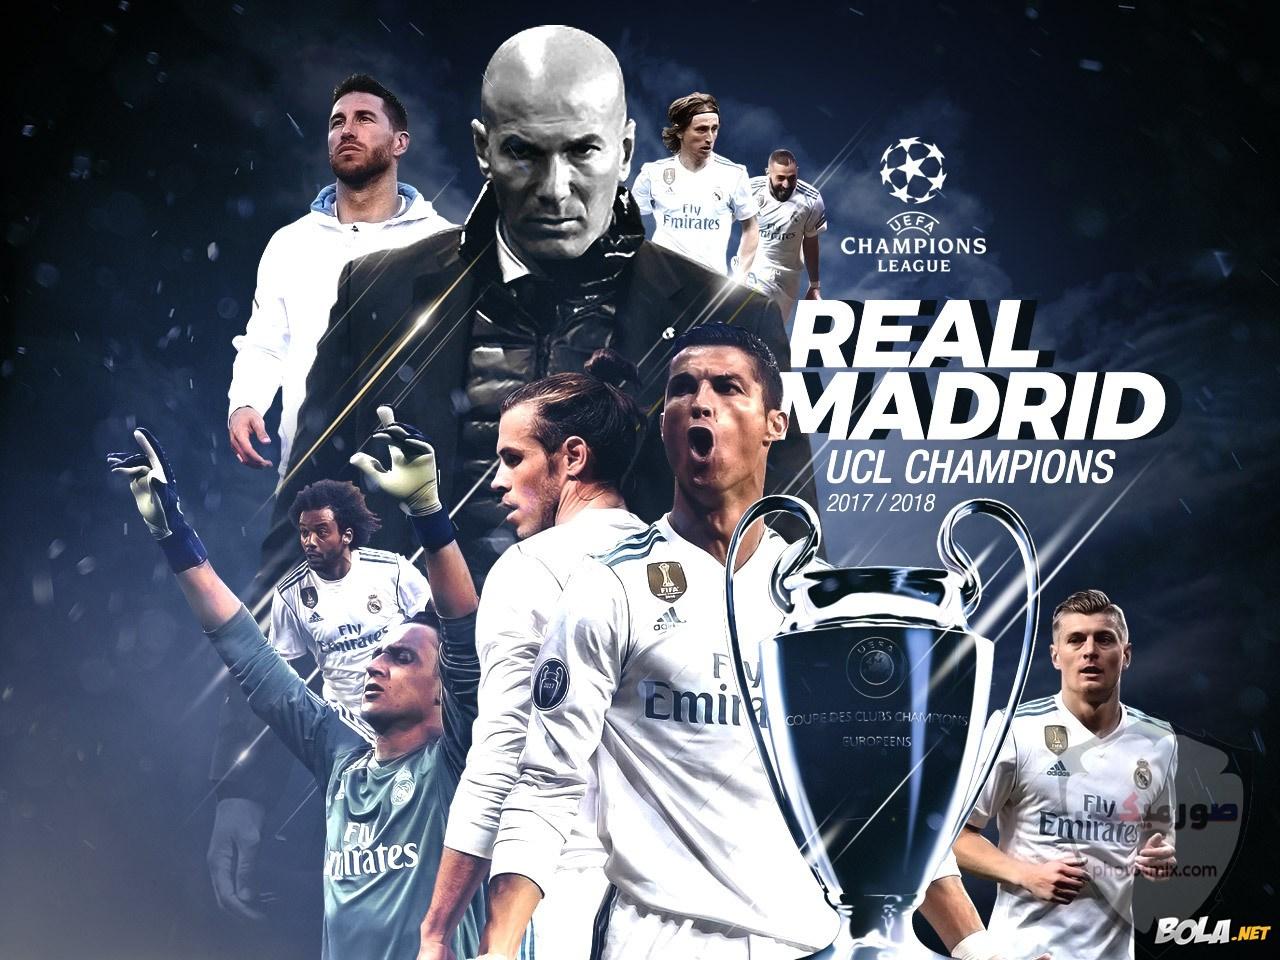 صور ريال مدريد 2020خلفيات ورمزيات ريال مدريد صور لاعبي ريال مدريد real madrid 22